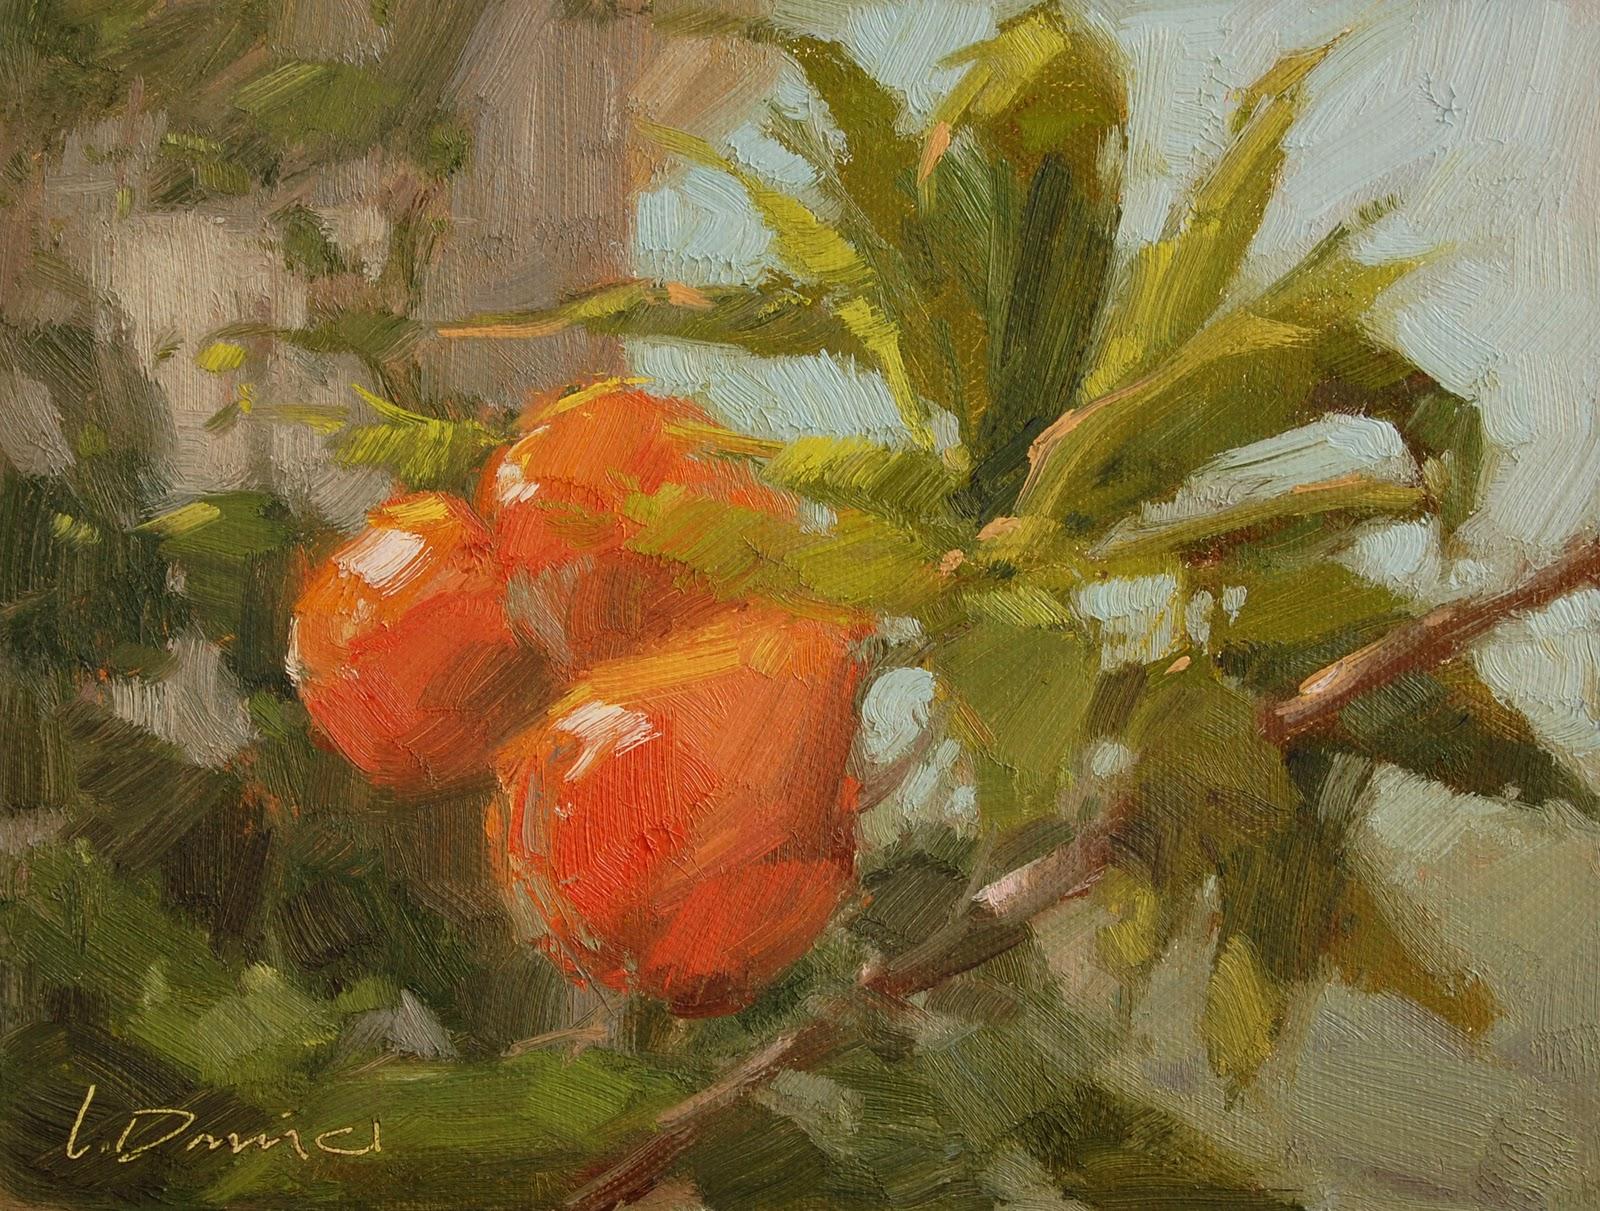 """Fruit Bearing Branches"" original fine art by Laurel Daniel"